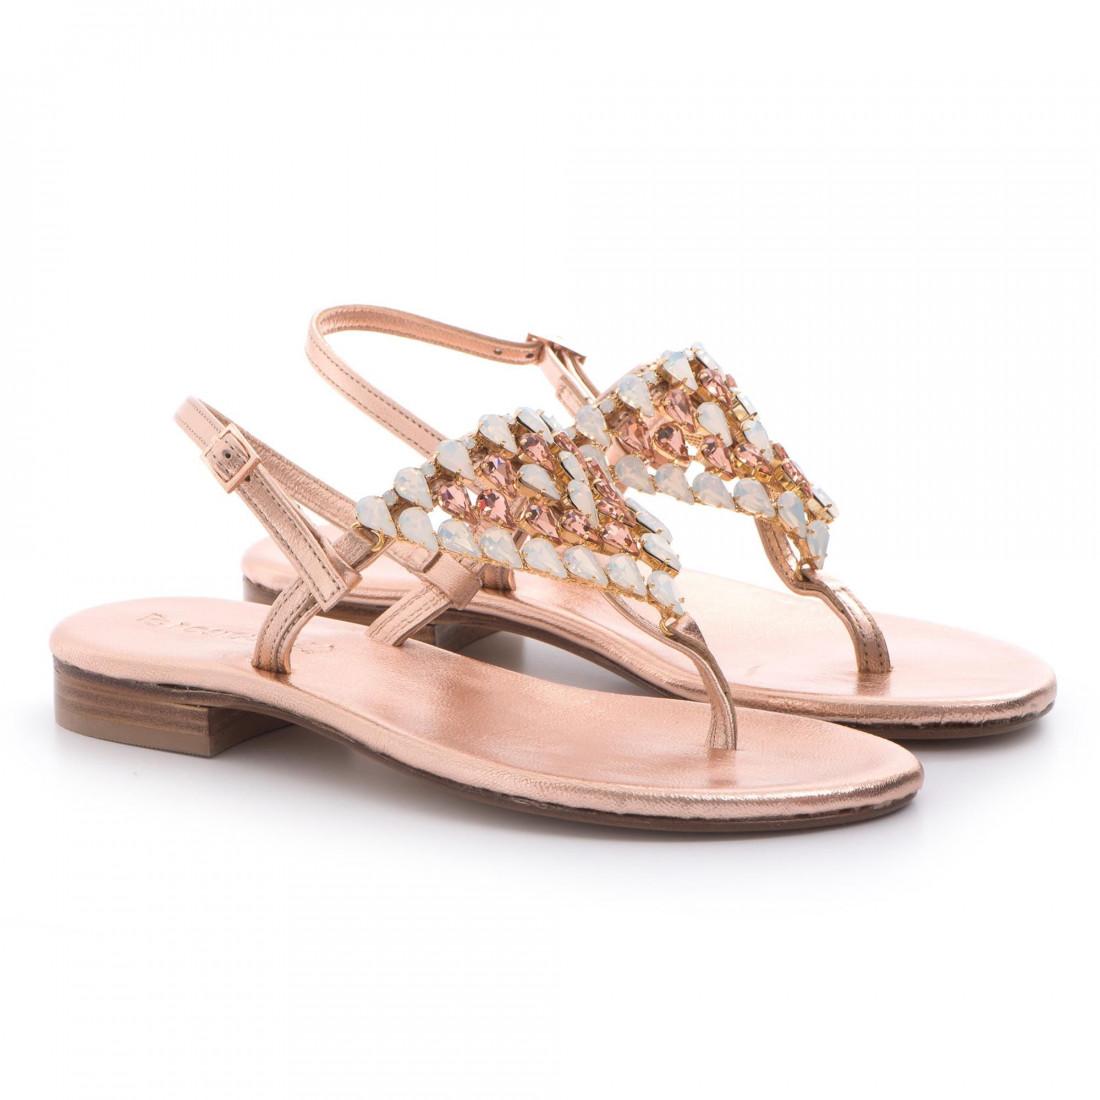 sandals woman positano 4911lam rame 3403